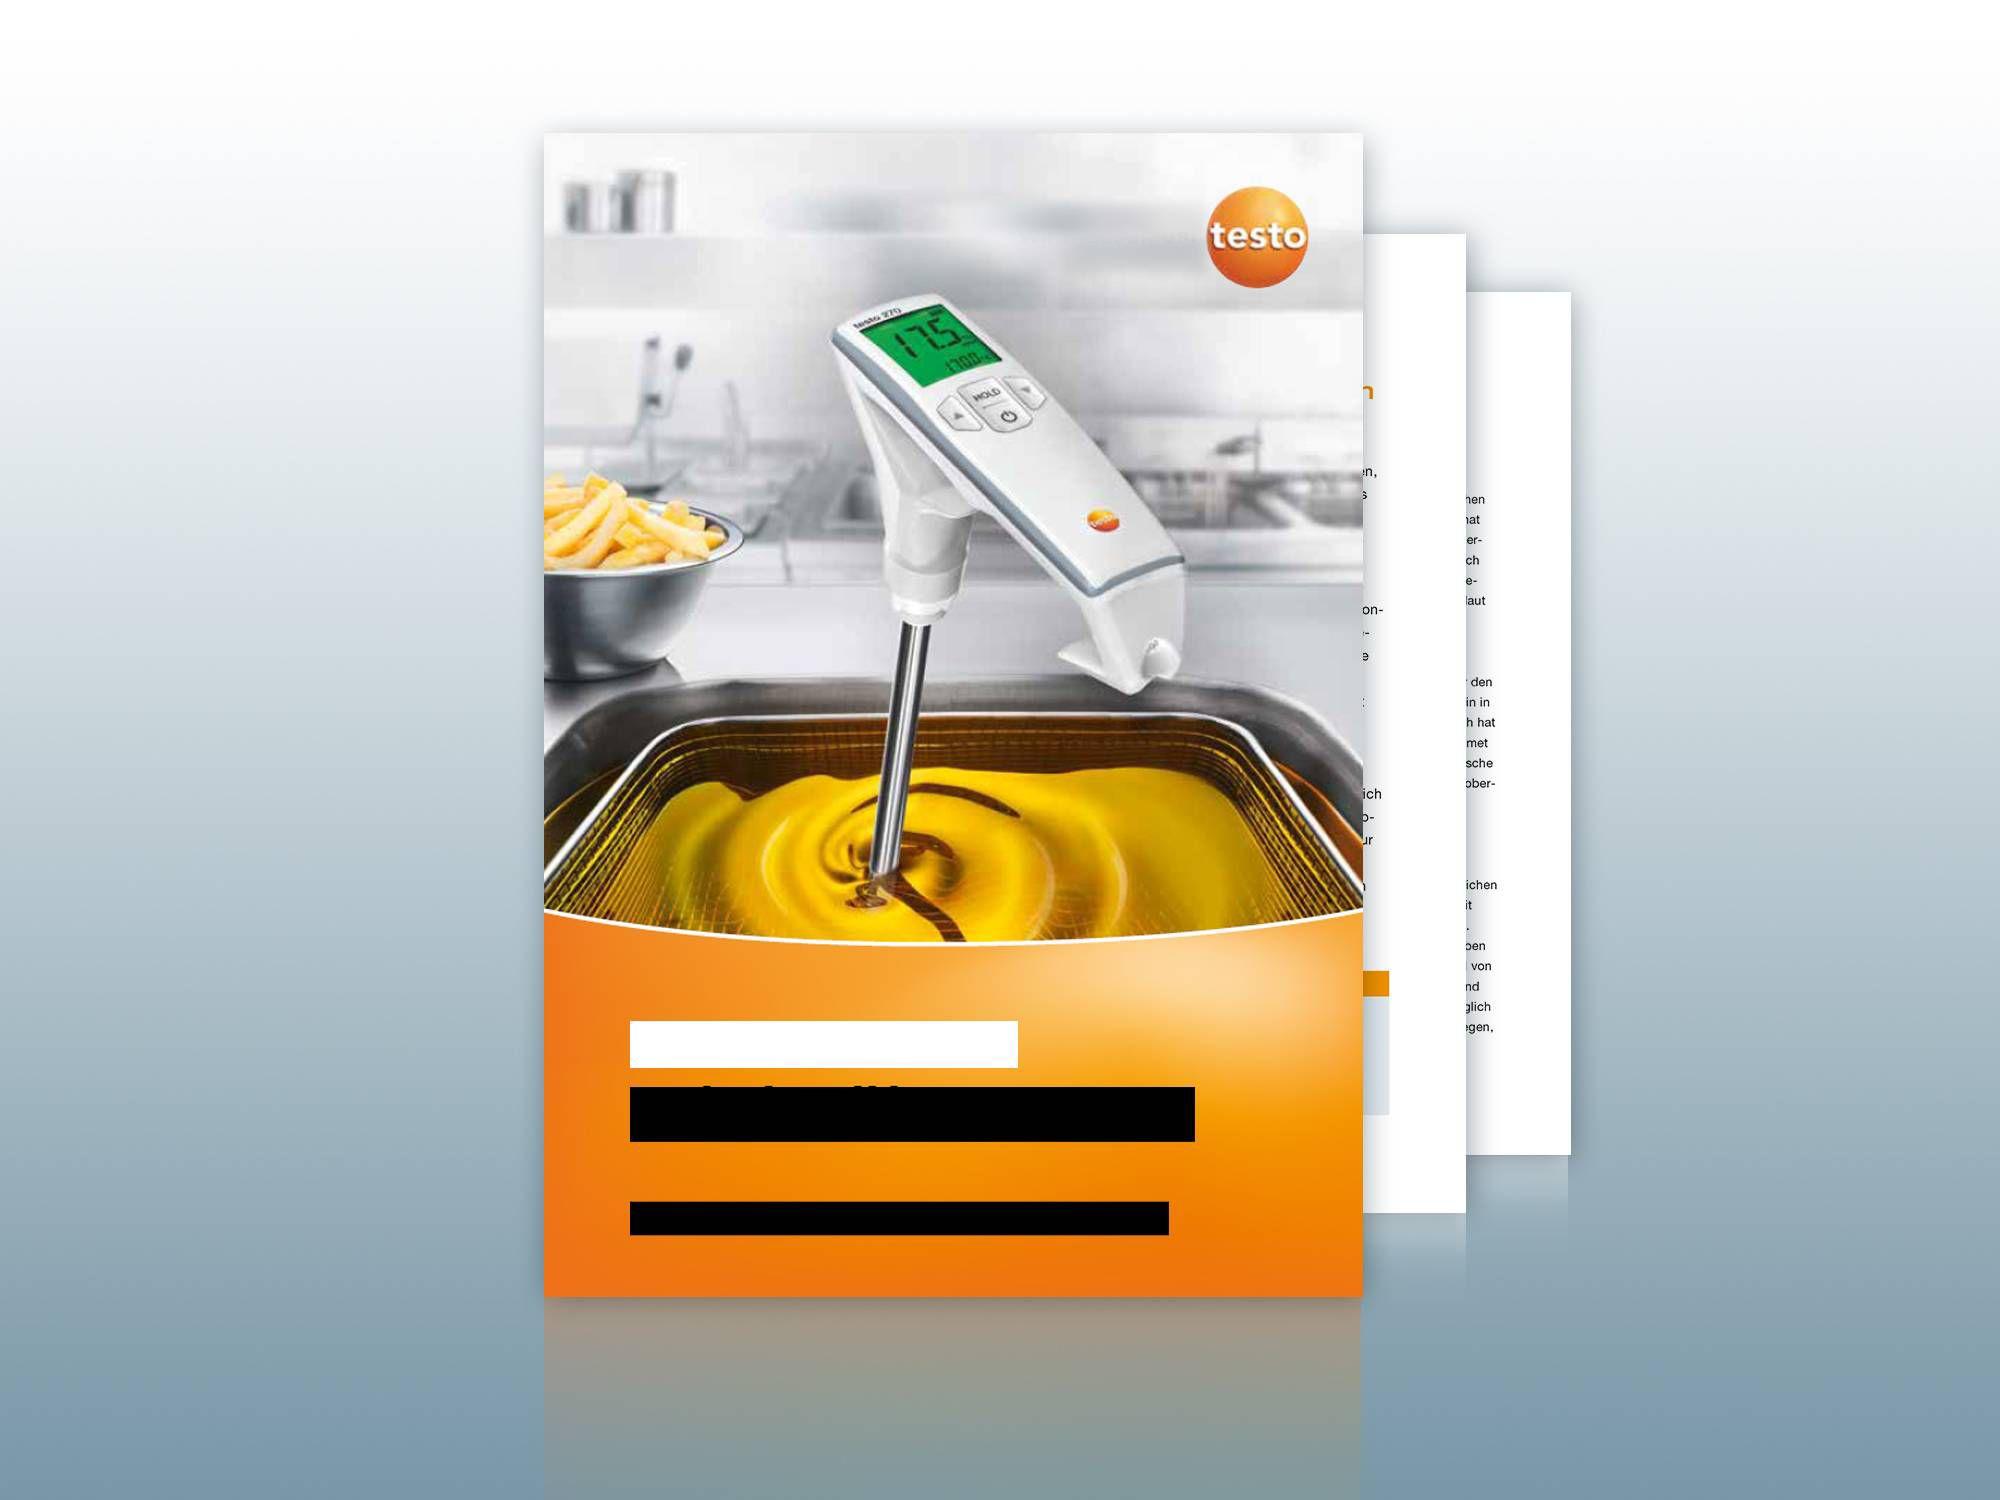 image-field-guide-cooking-oil-2980-3015-15.jpg